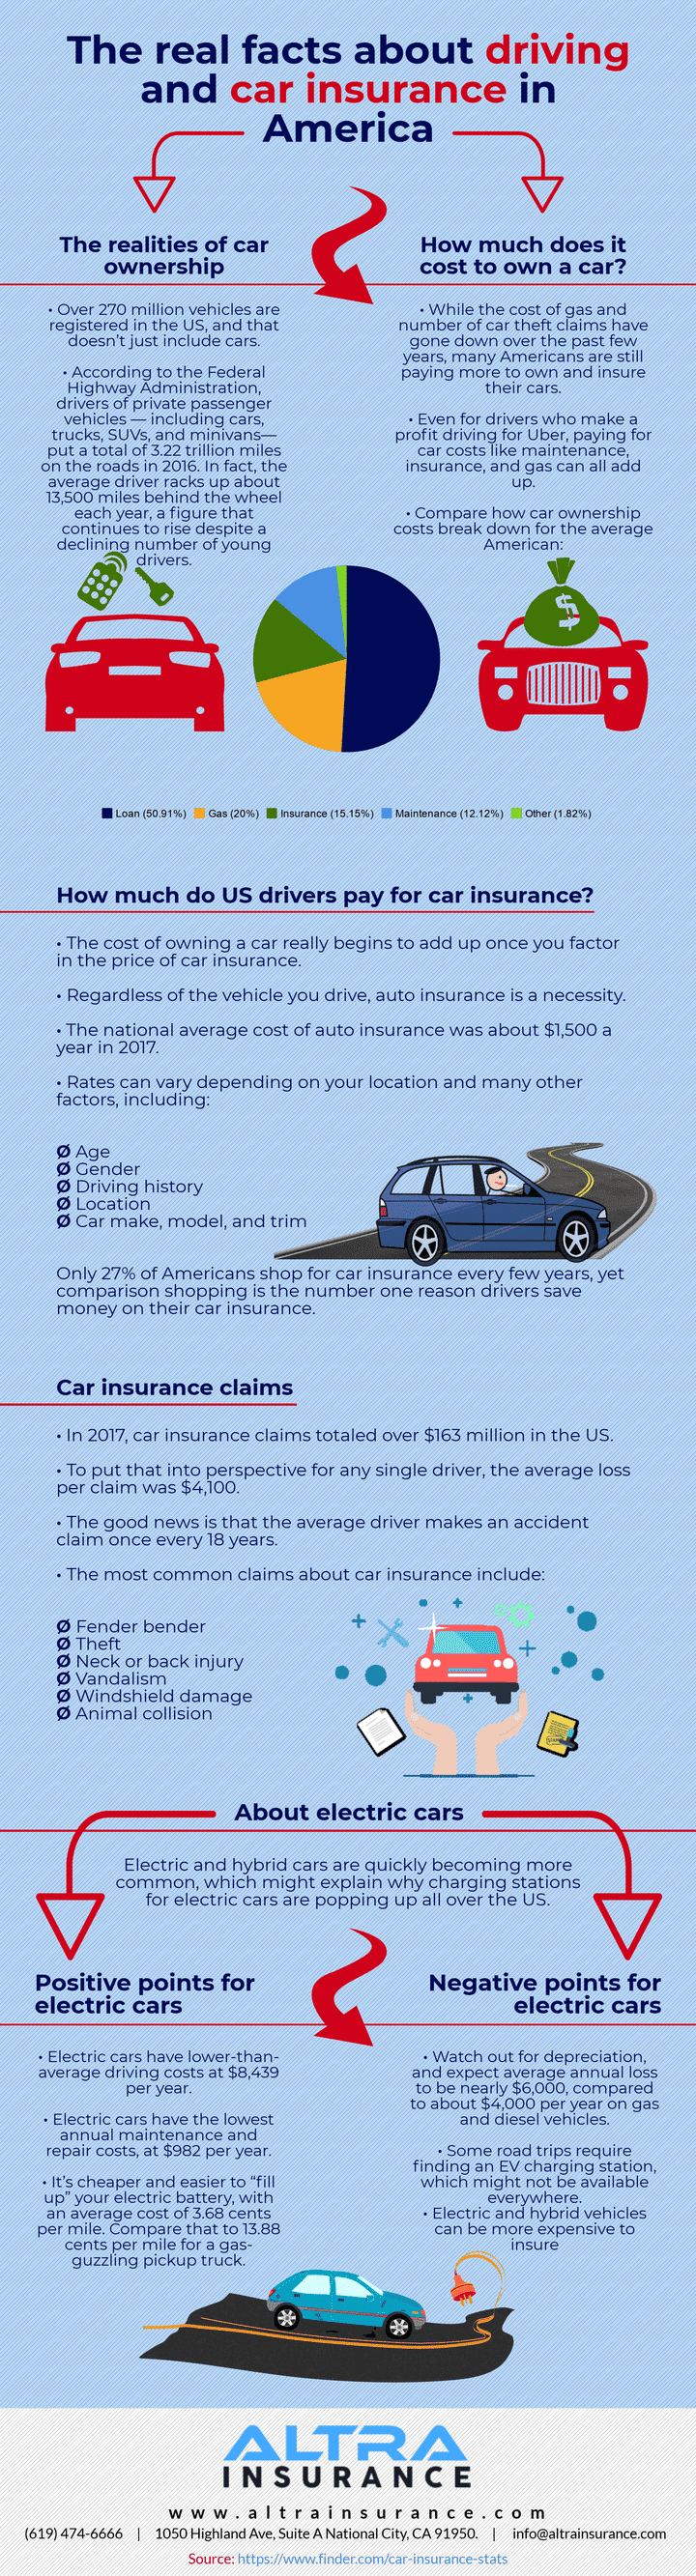 Auto Insurance Statistics 2019 America Infographic